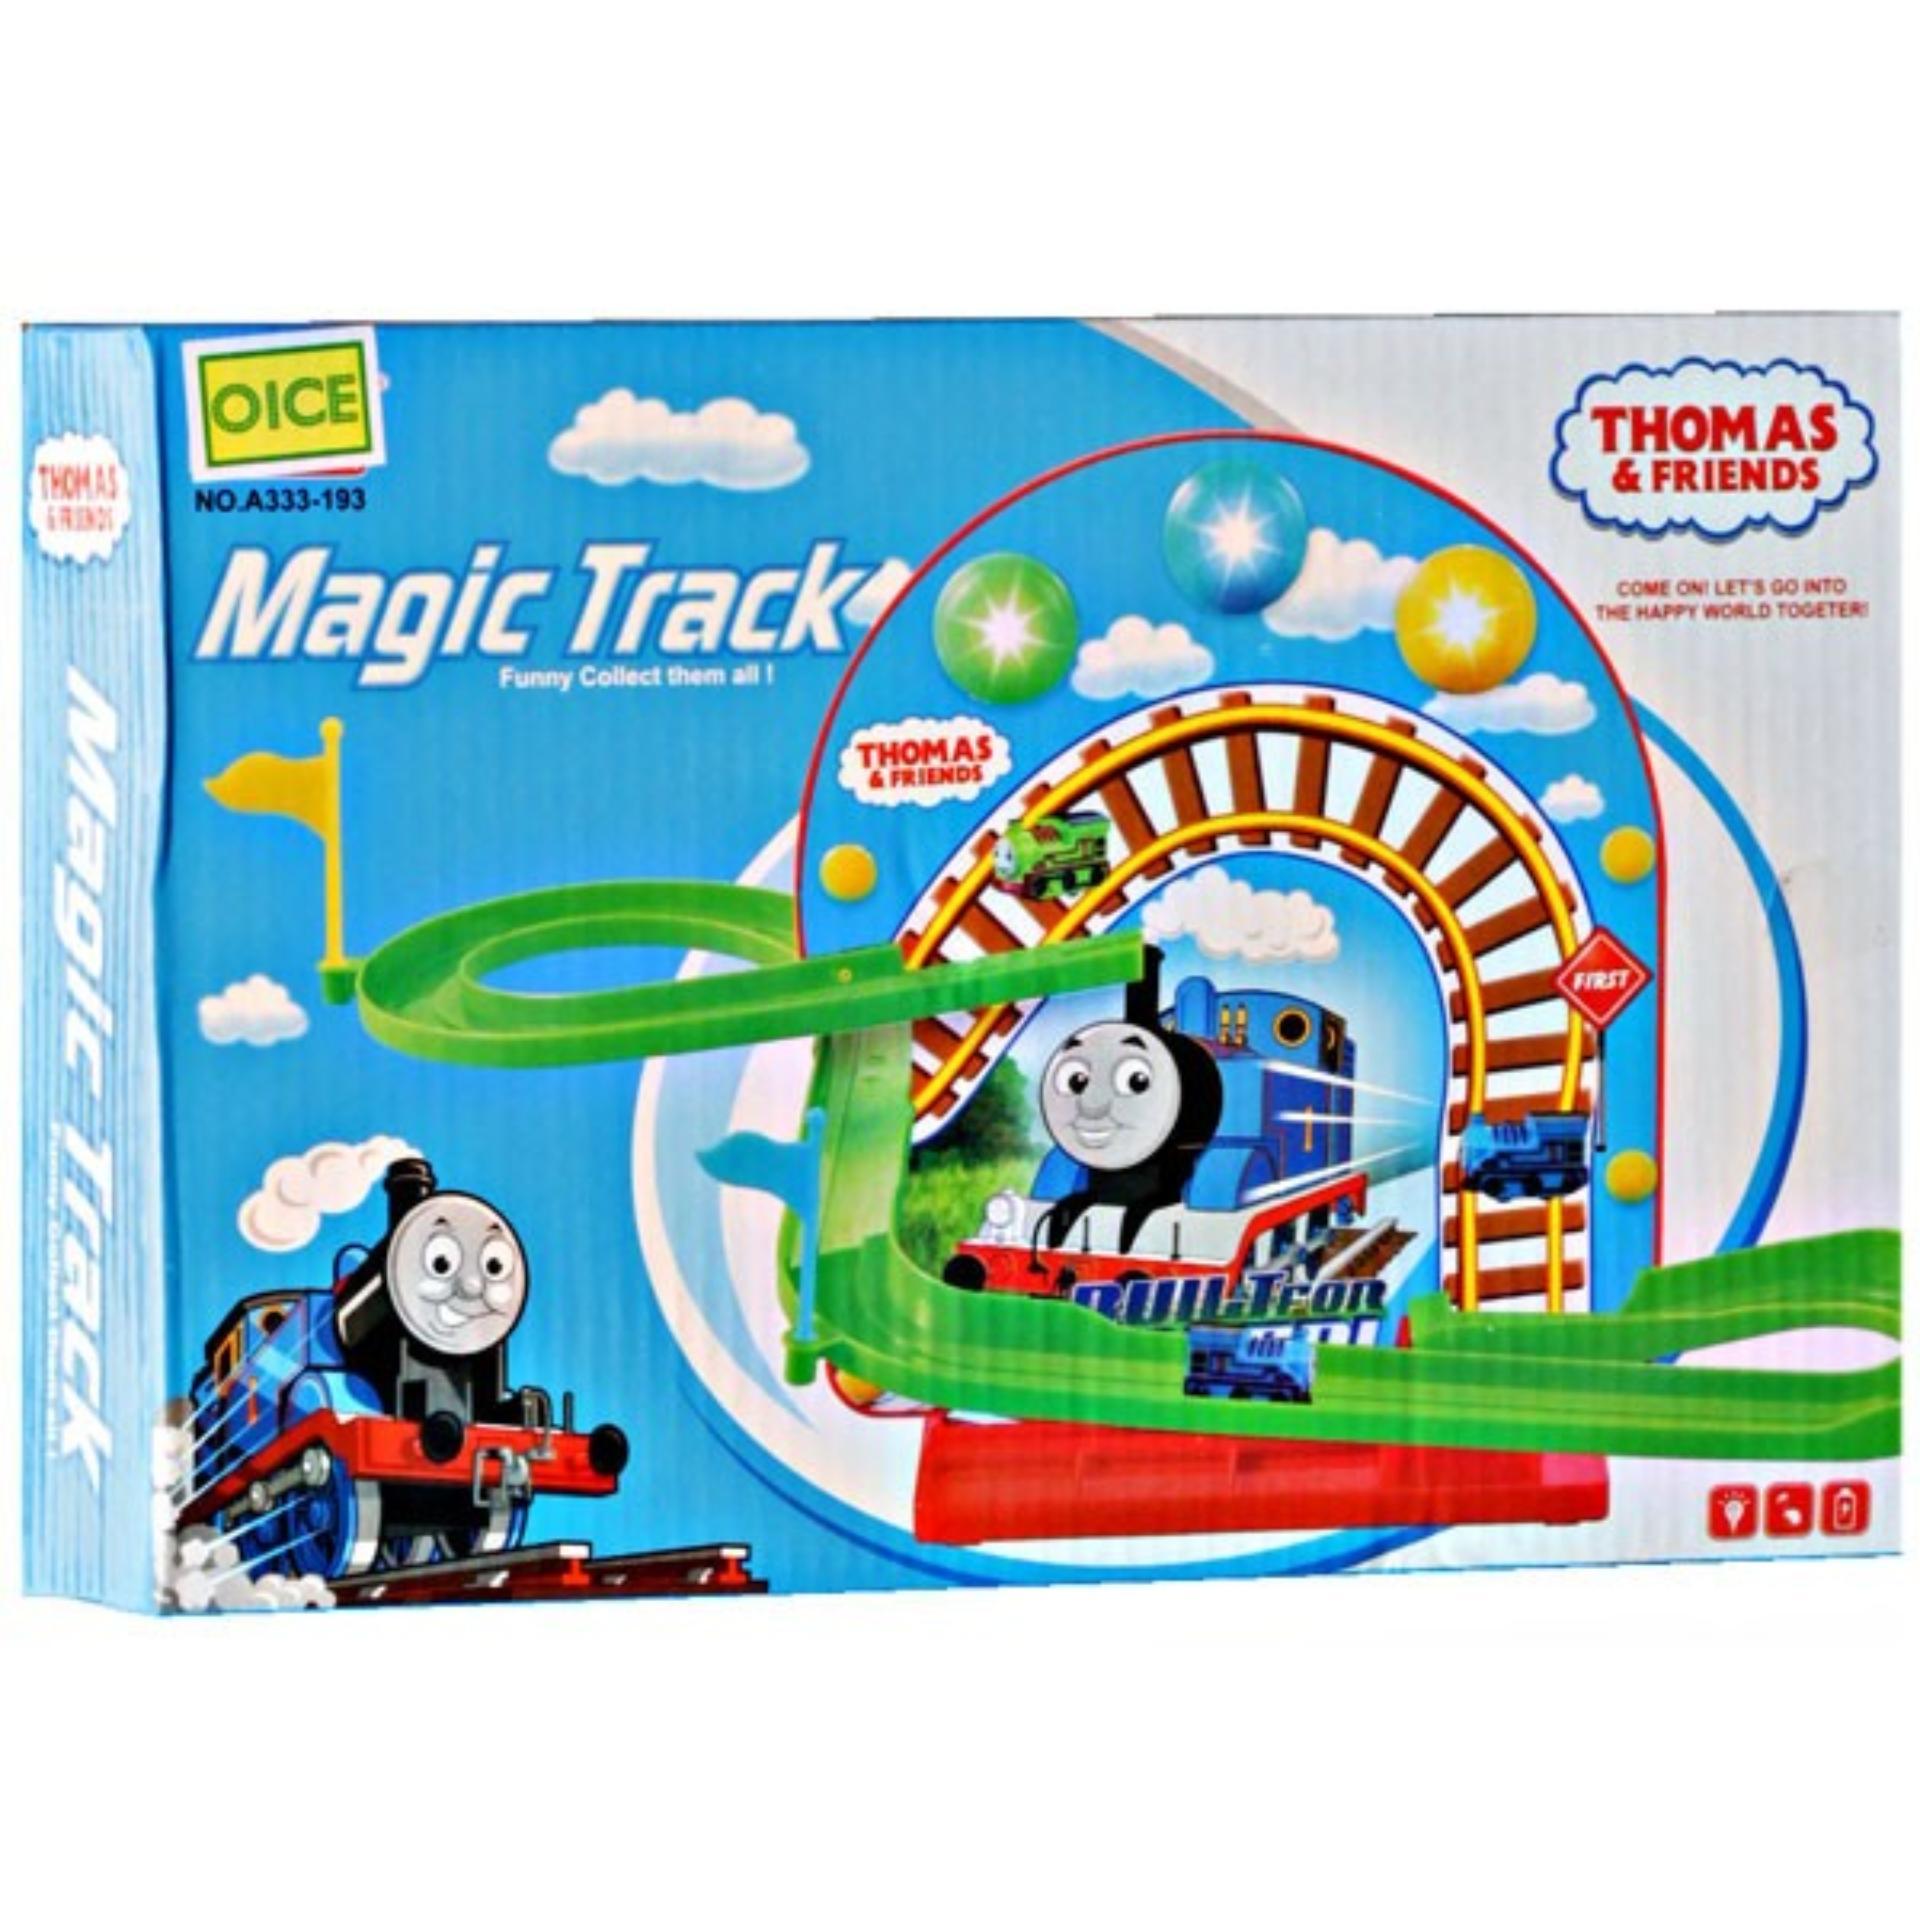 AA Toys Thomas Train Track A333-193 - Magic Track Mainan Kereta API ...